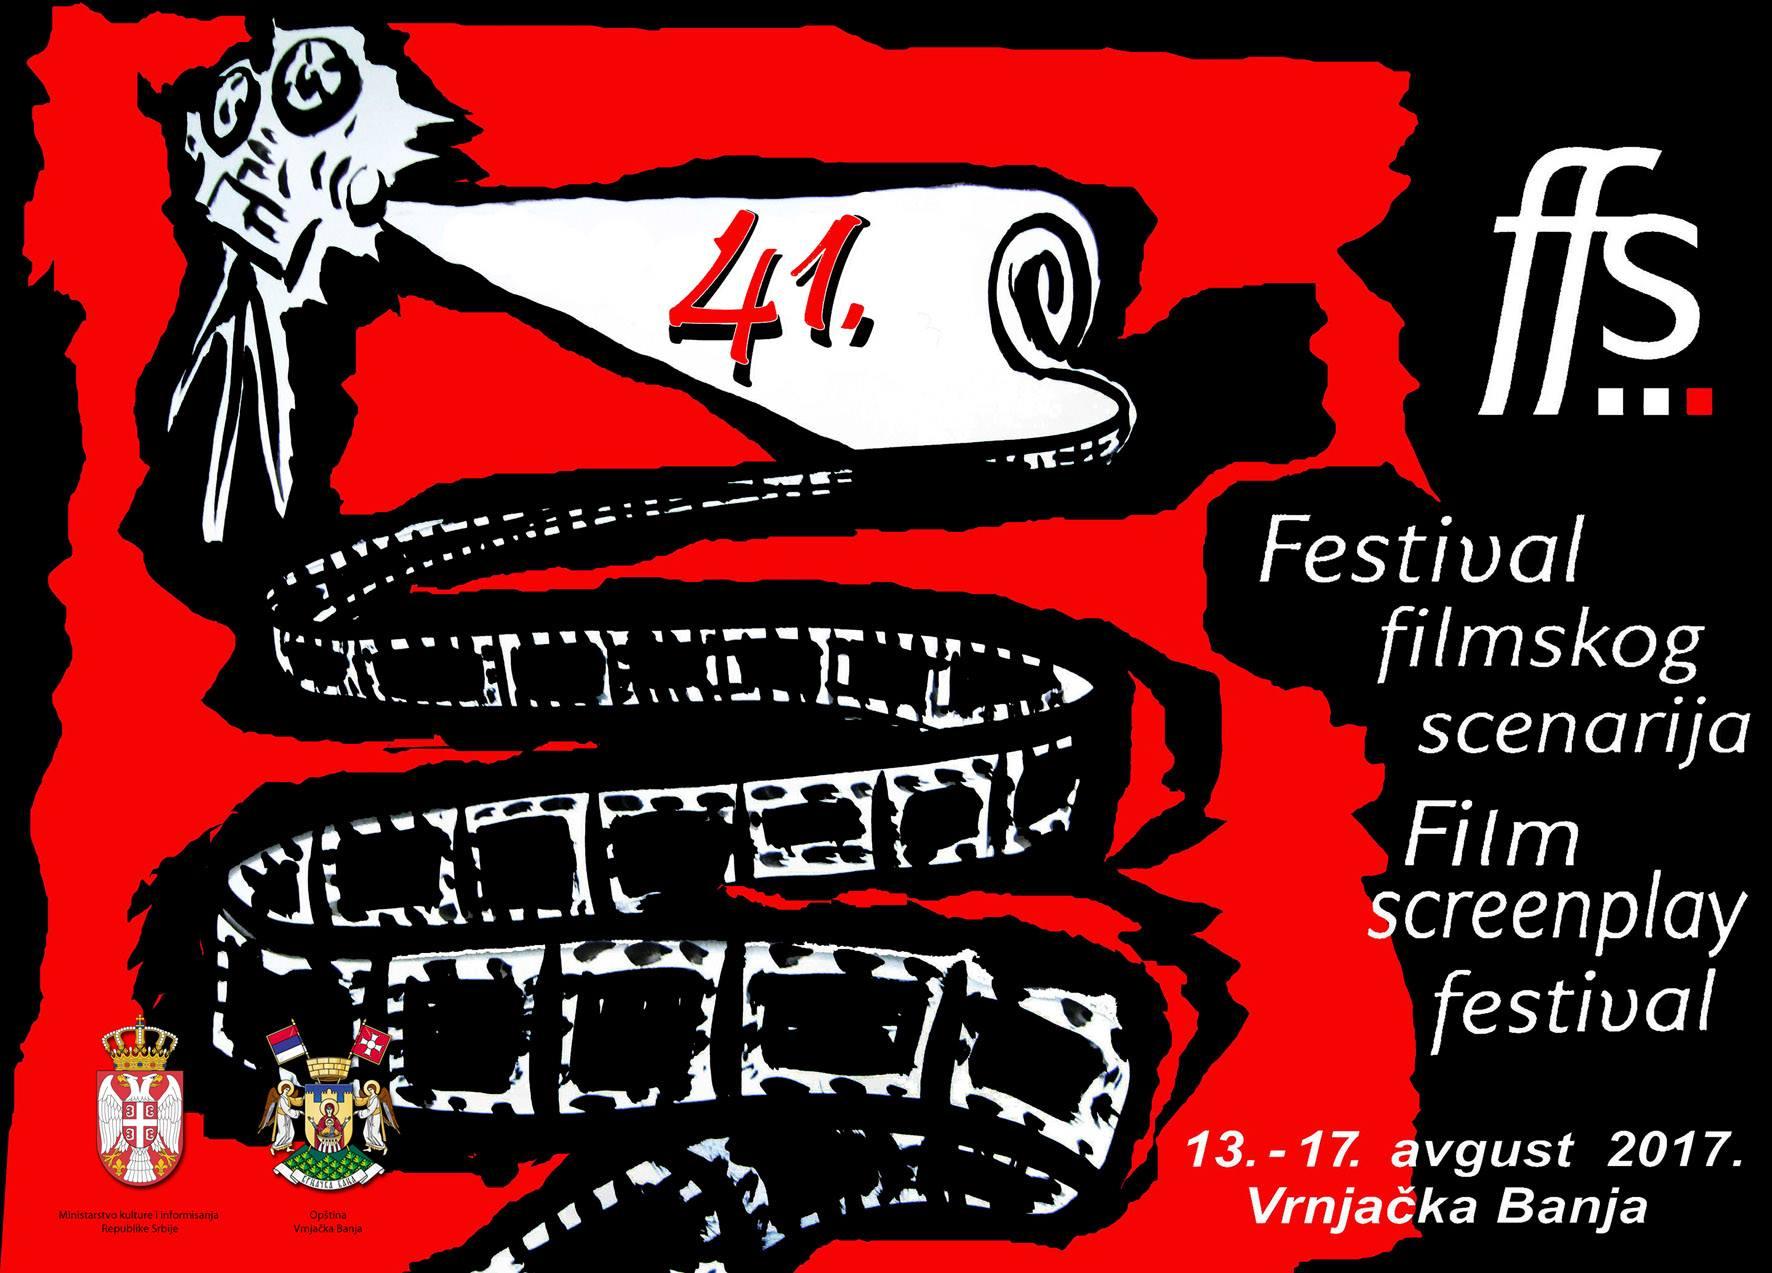 Festival filmskog scenarija, Vrnjačka Banja